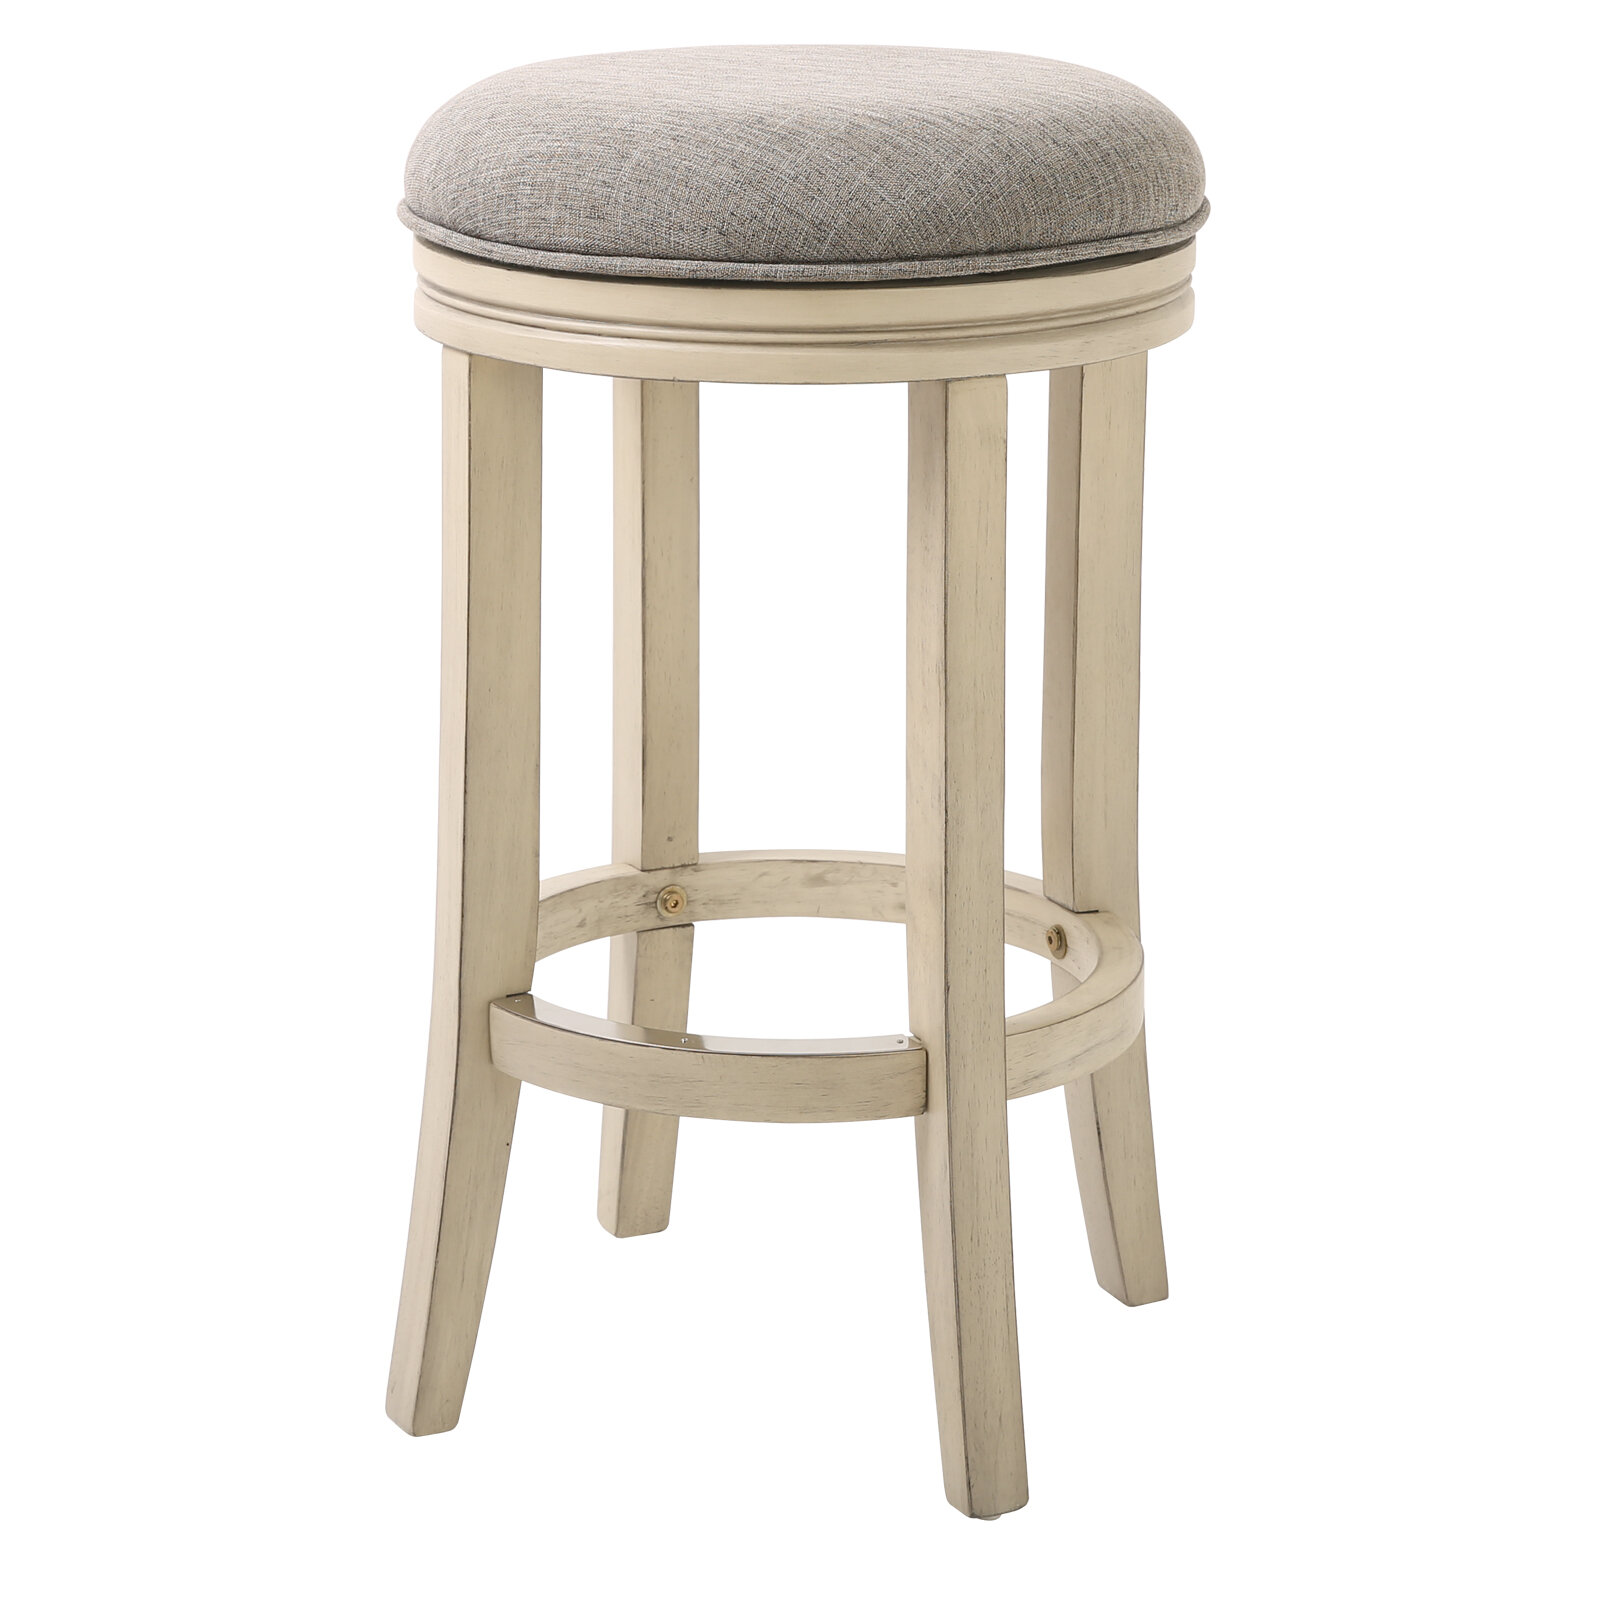 Peachy Mcgrady Counter Height 25 Swivel Bar Stool Lamtechconsult Wood Chair Design Ideas Lamtechconsultcom